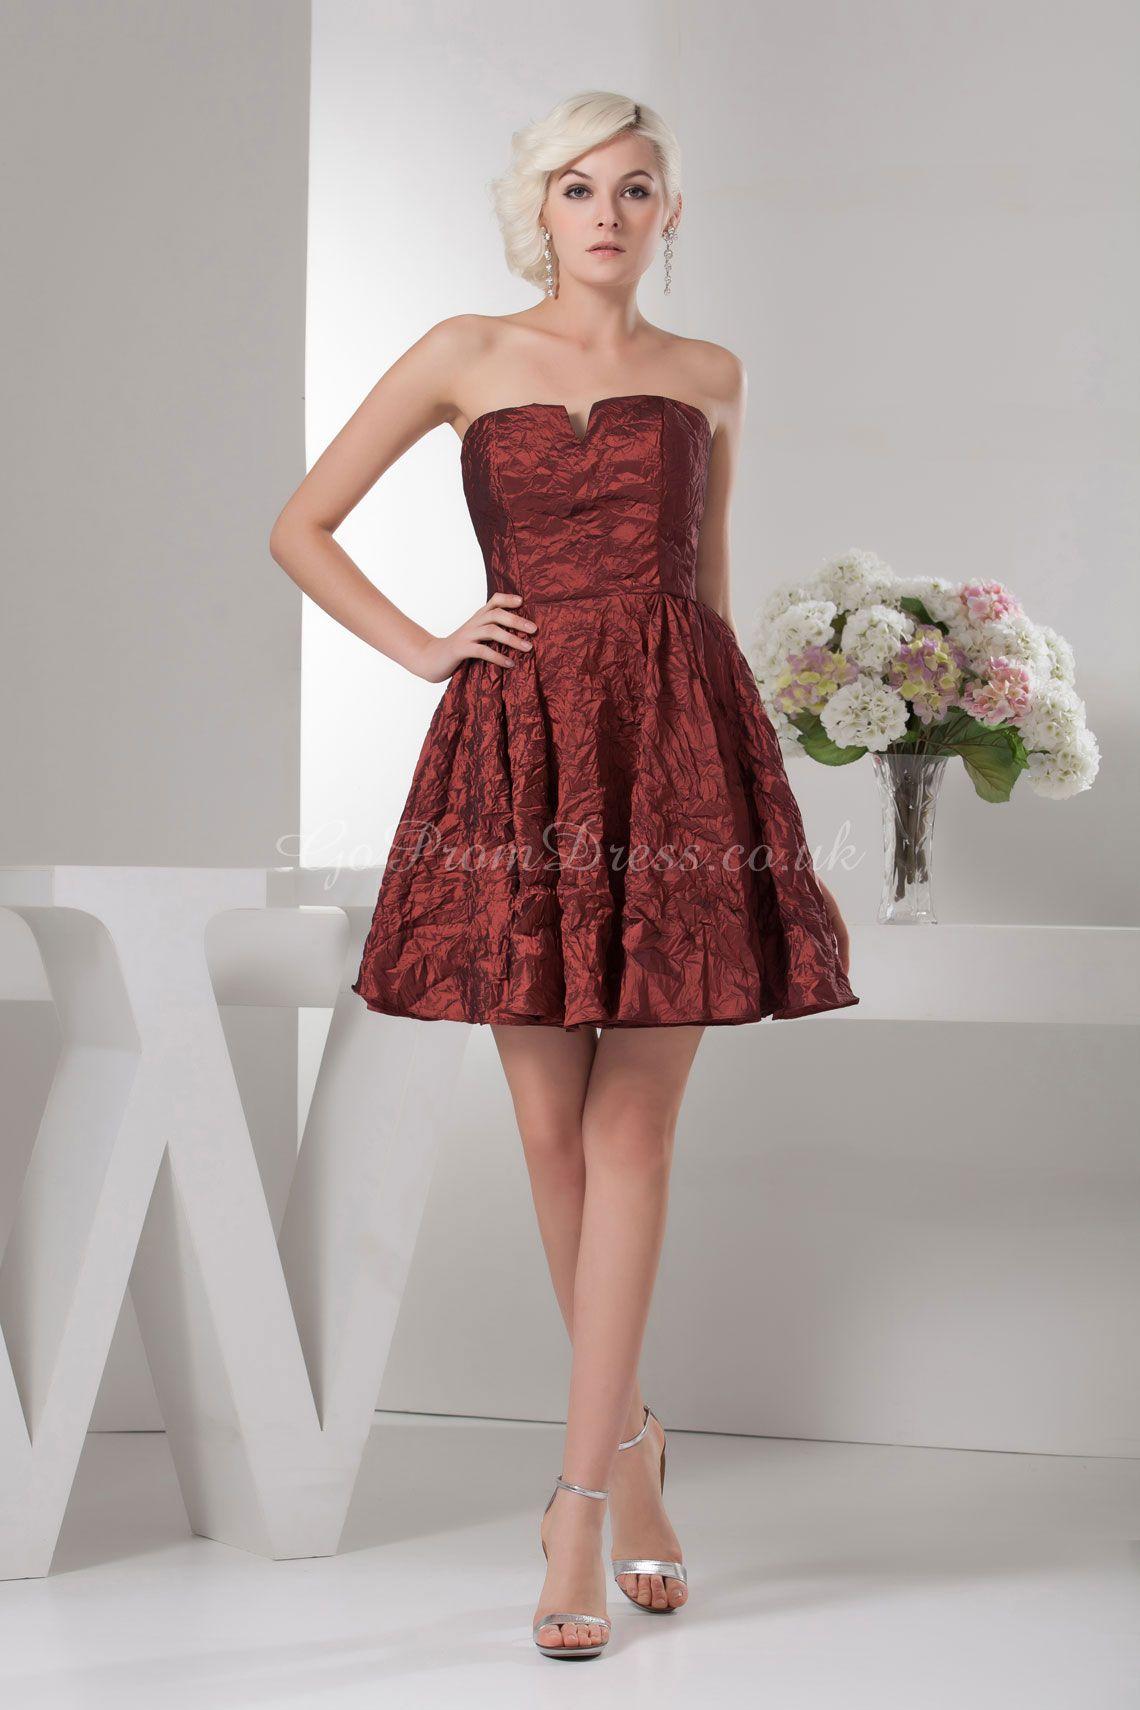 Red dress for wedding reception  Bridesmaid Dress  Lovely dream wedding  Pinterest  Weddings and